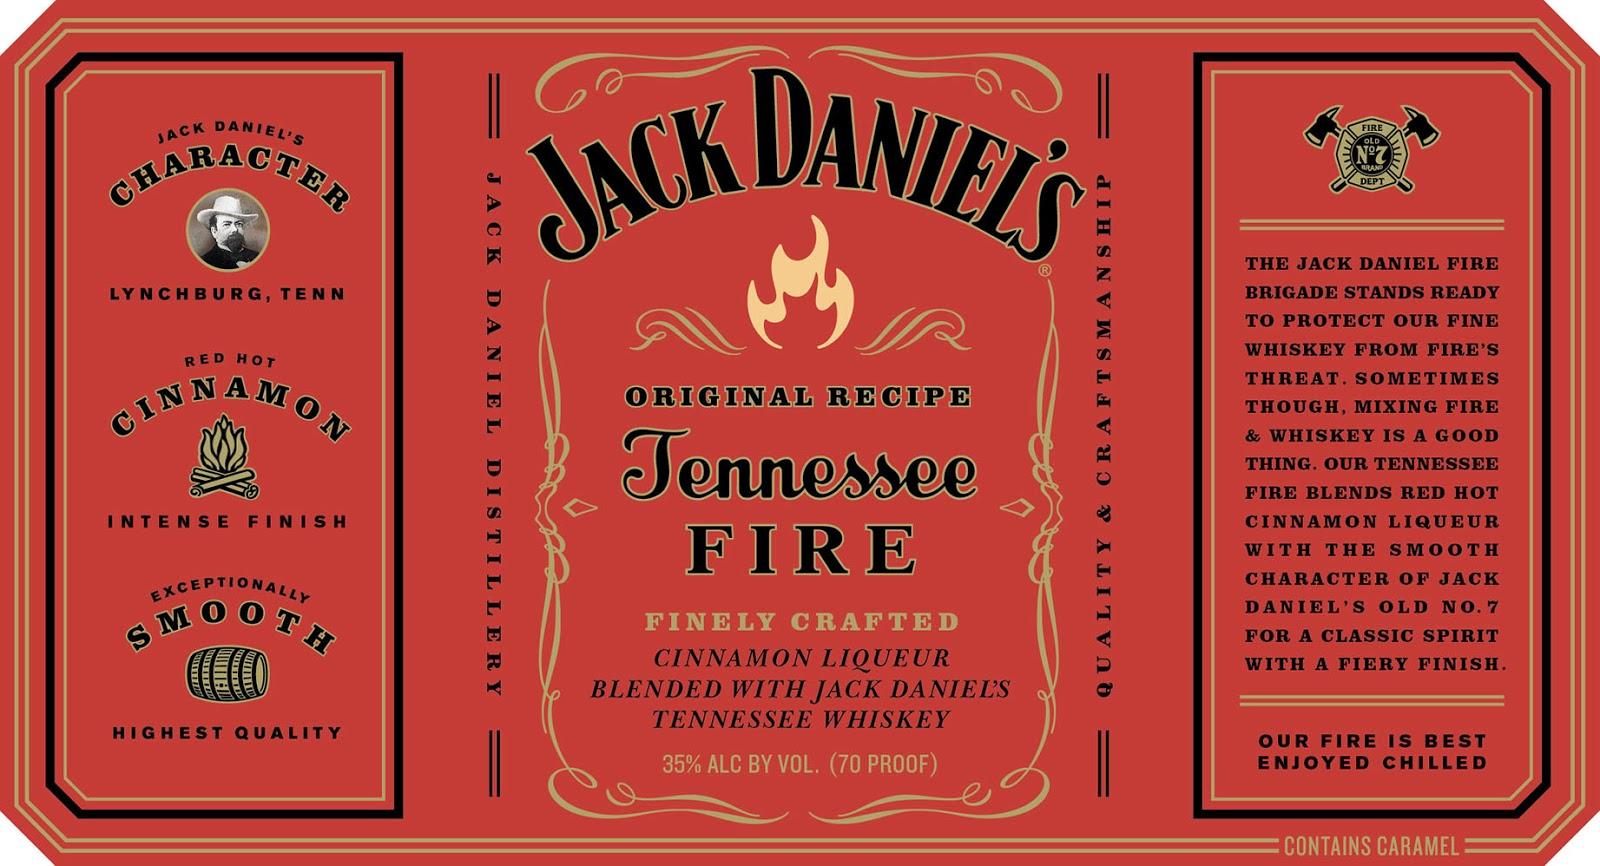 Dutchjack - Jack Daniels Label